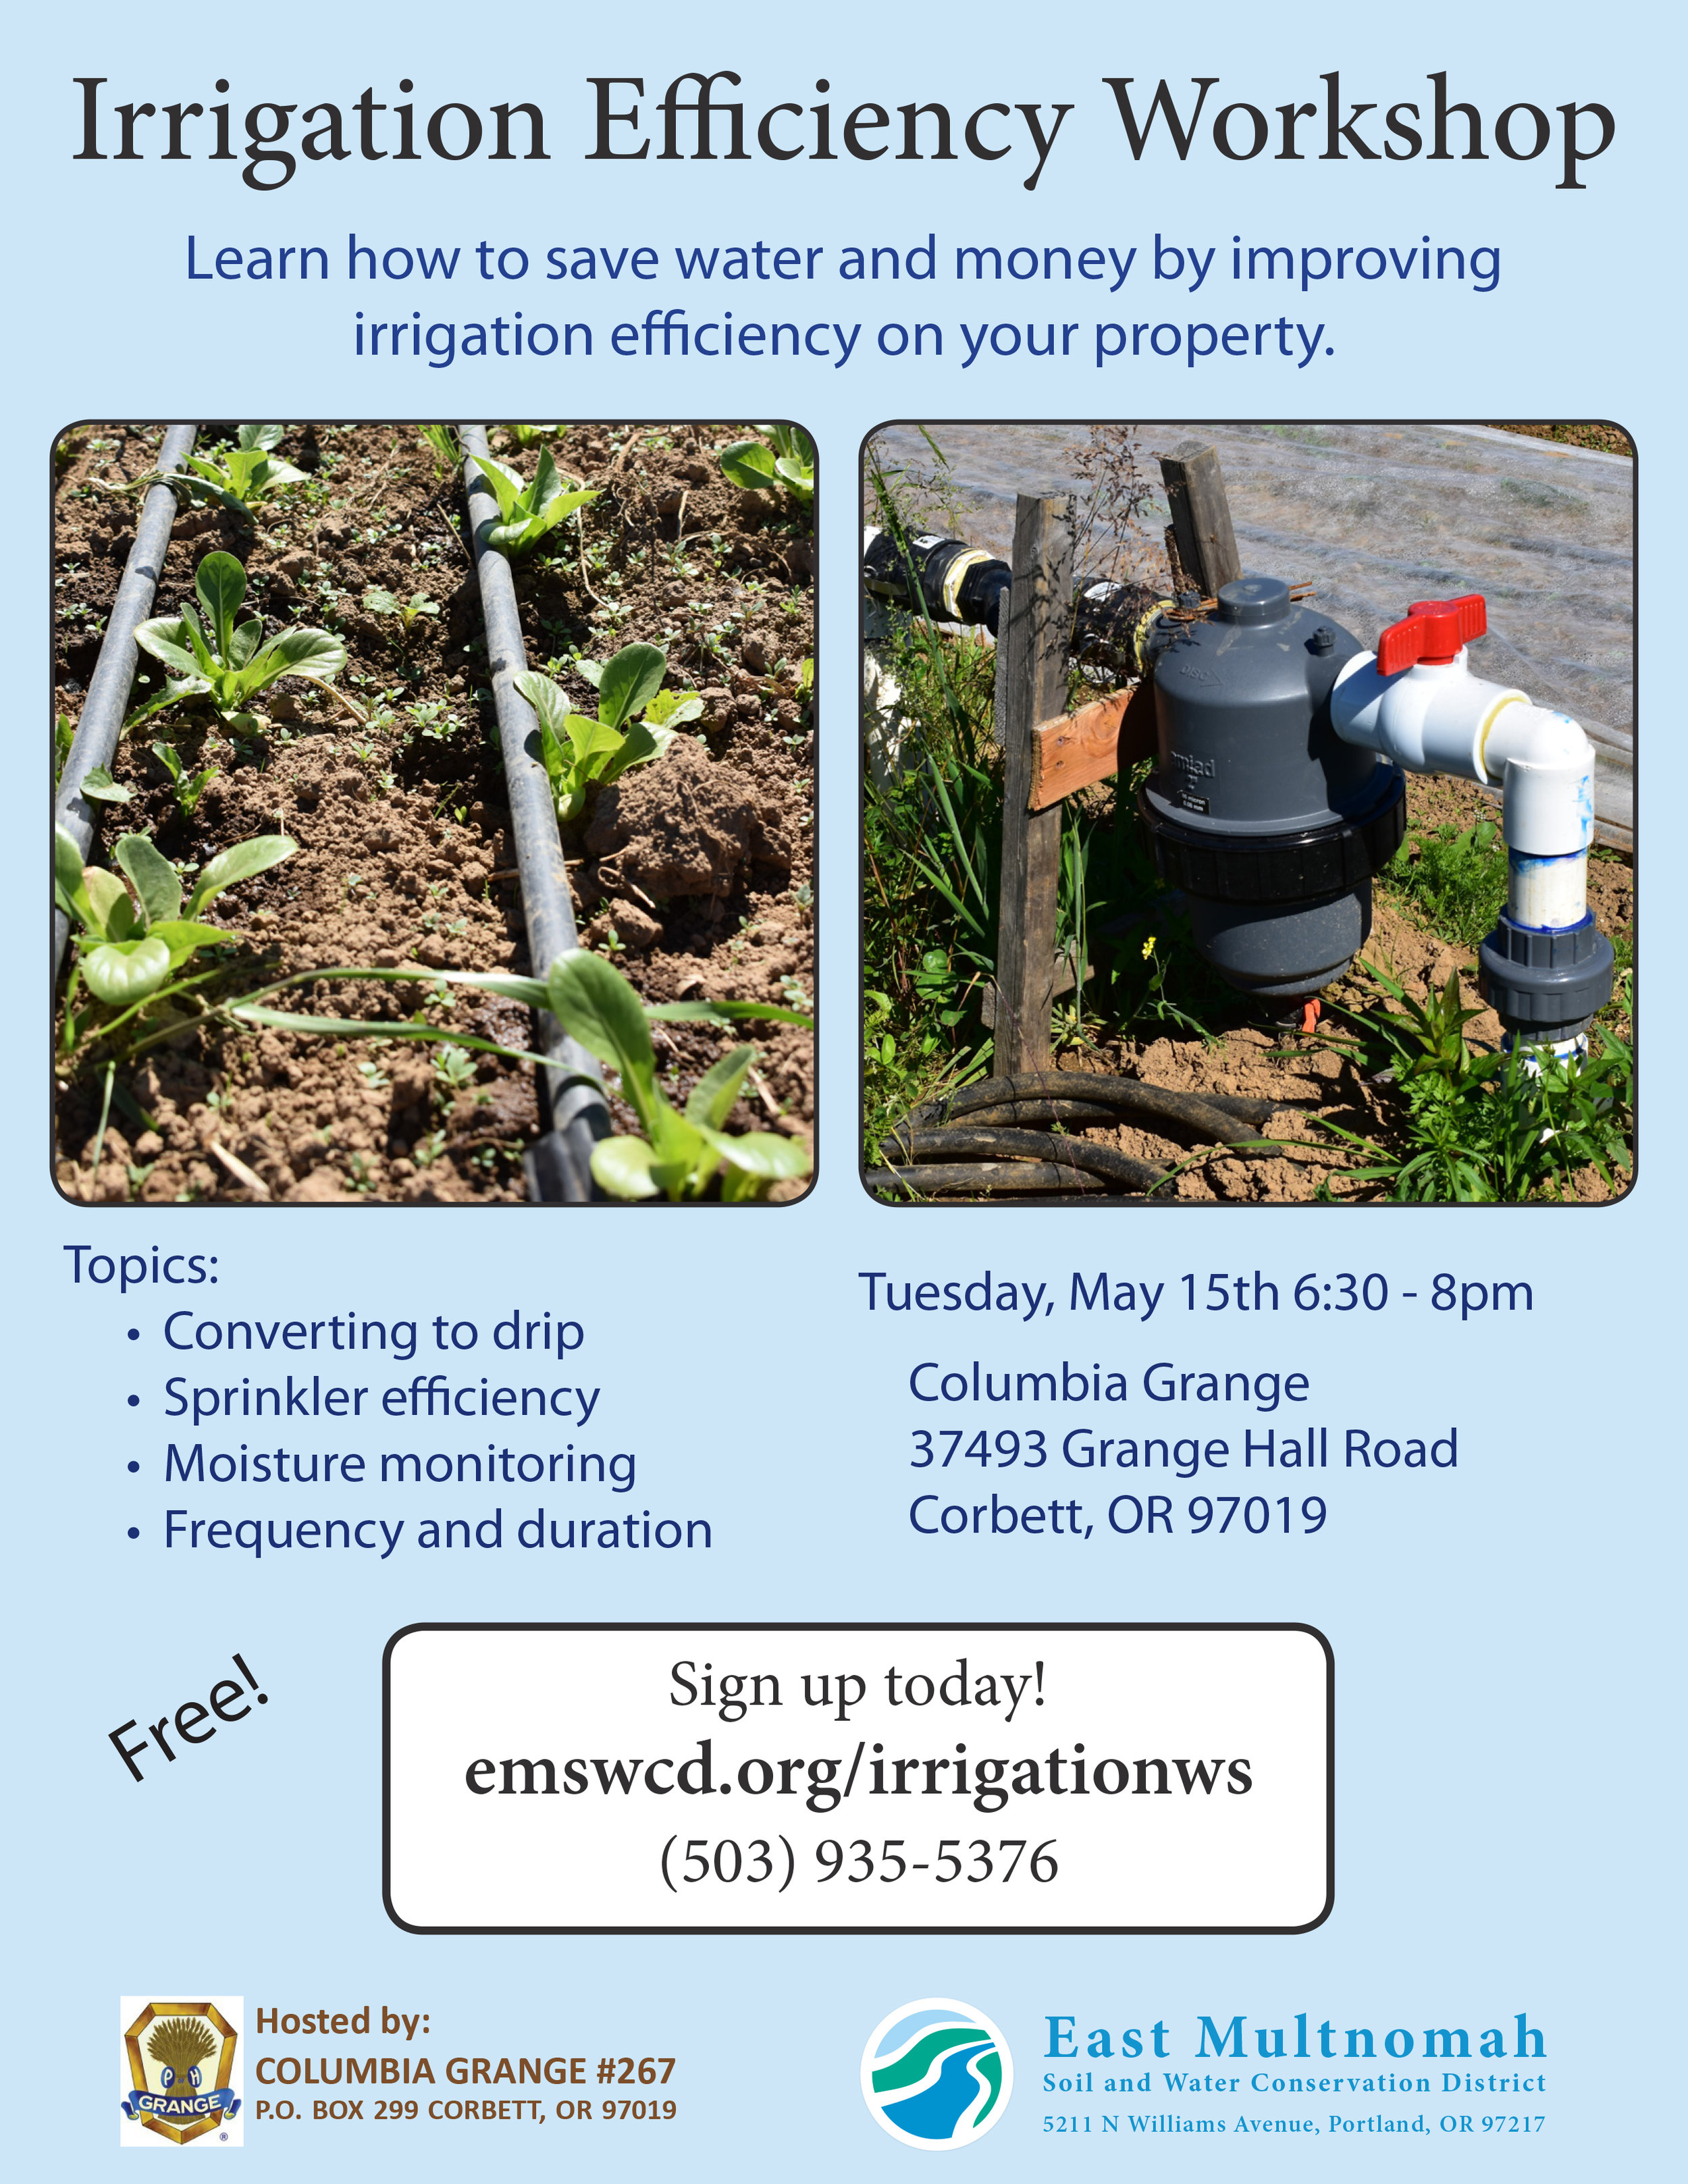 Irrigation workshop flier.jpg